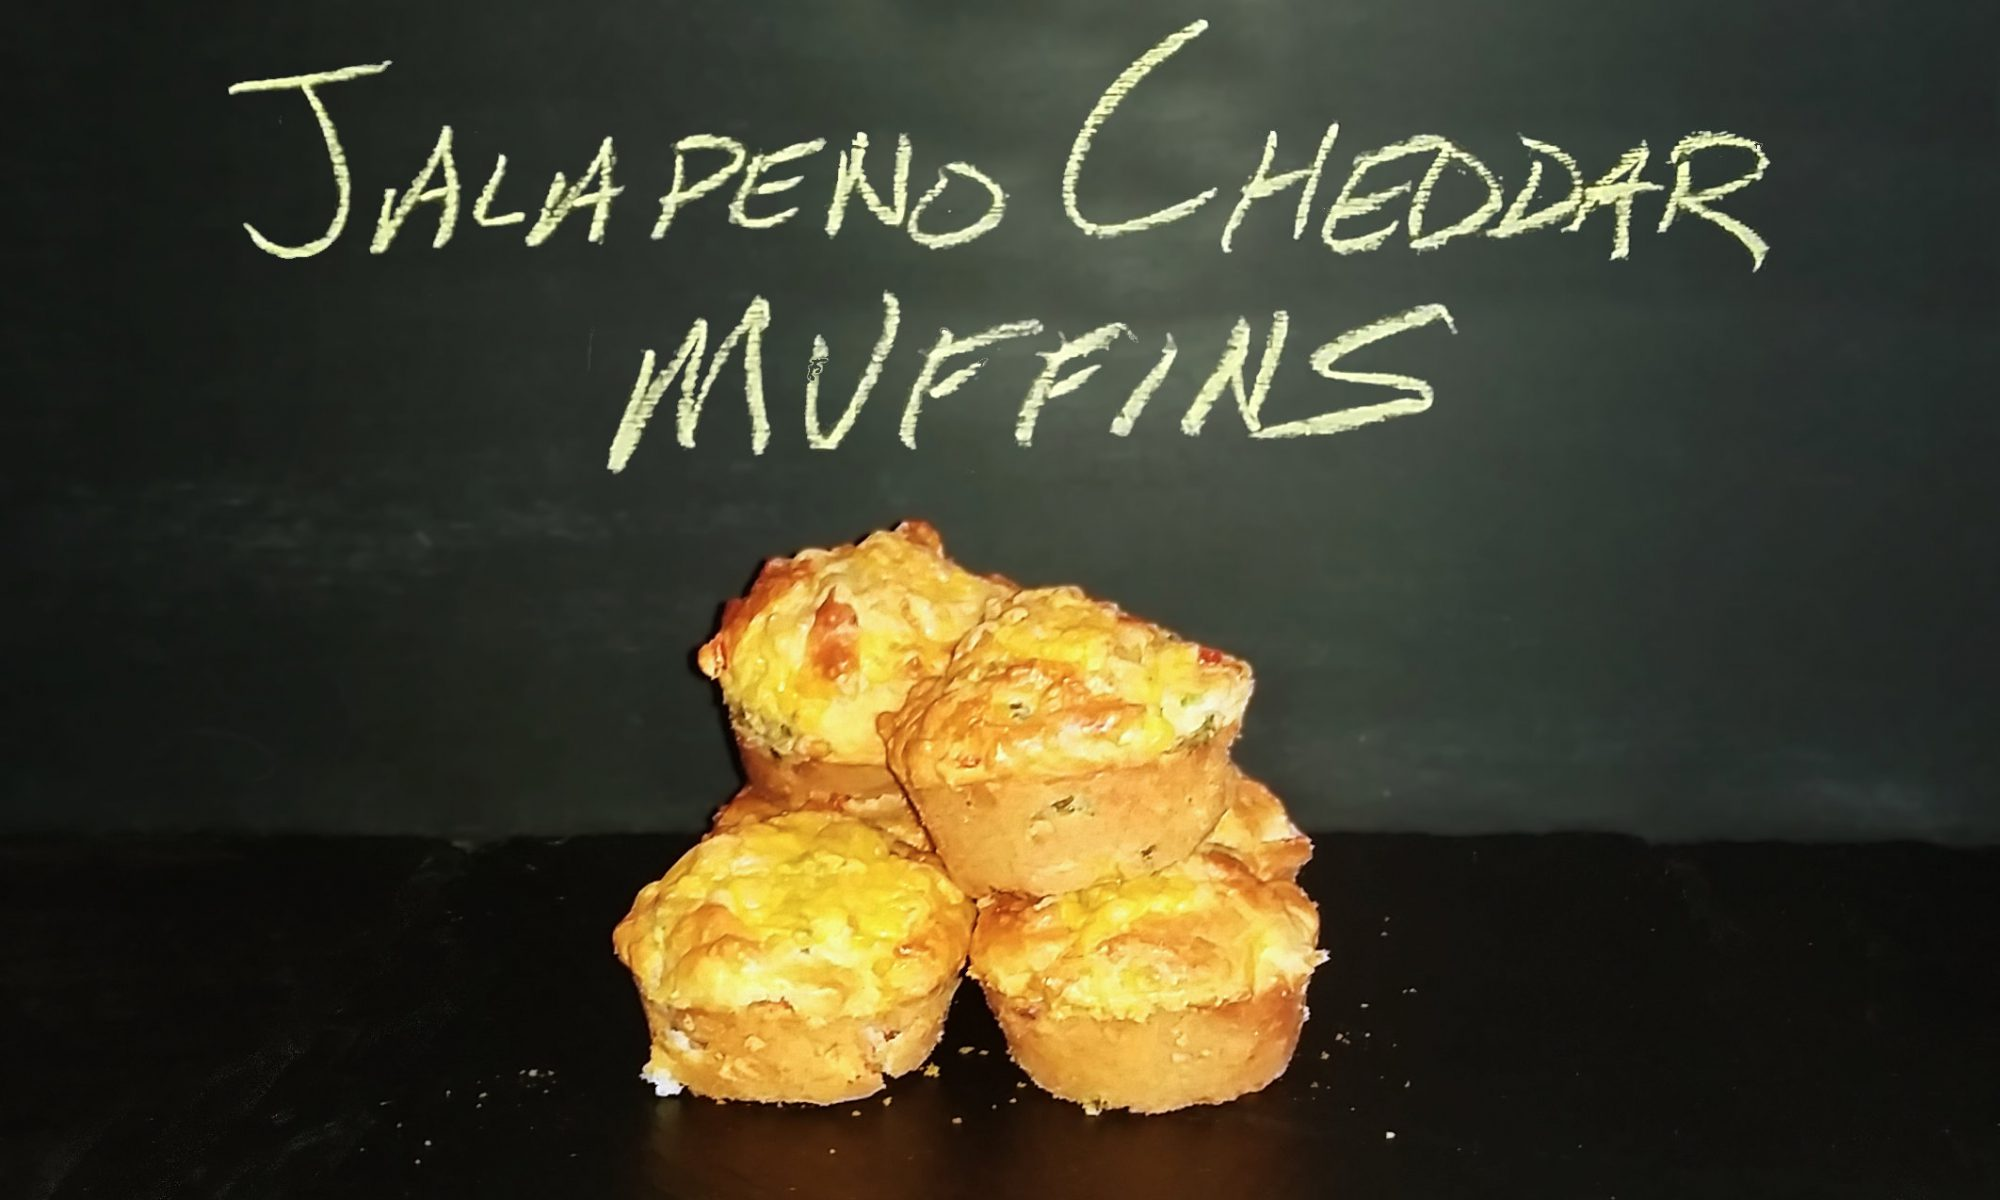 jalapeno cheddar muffin image